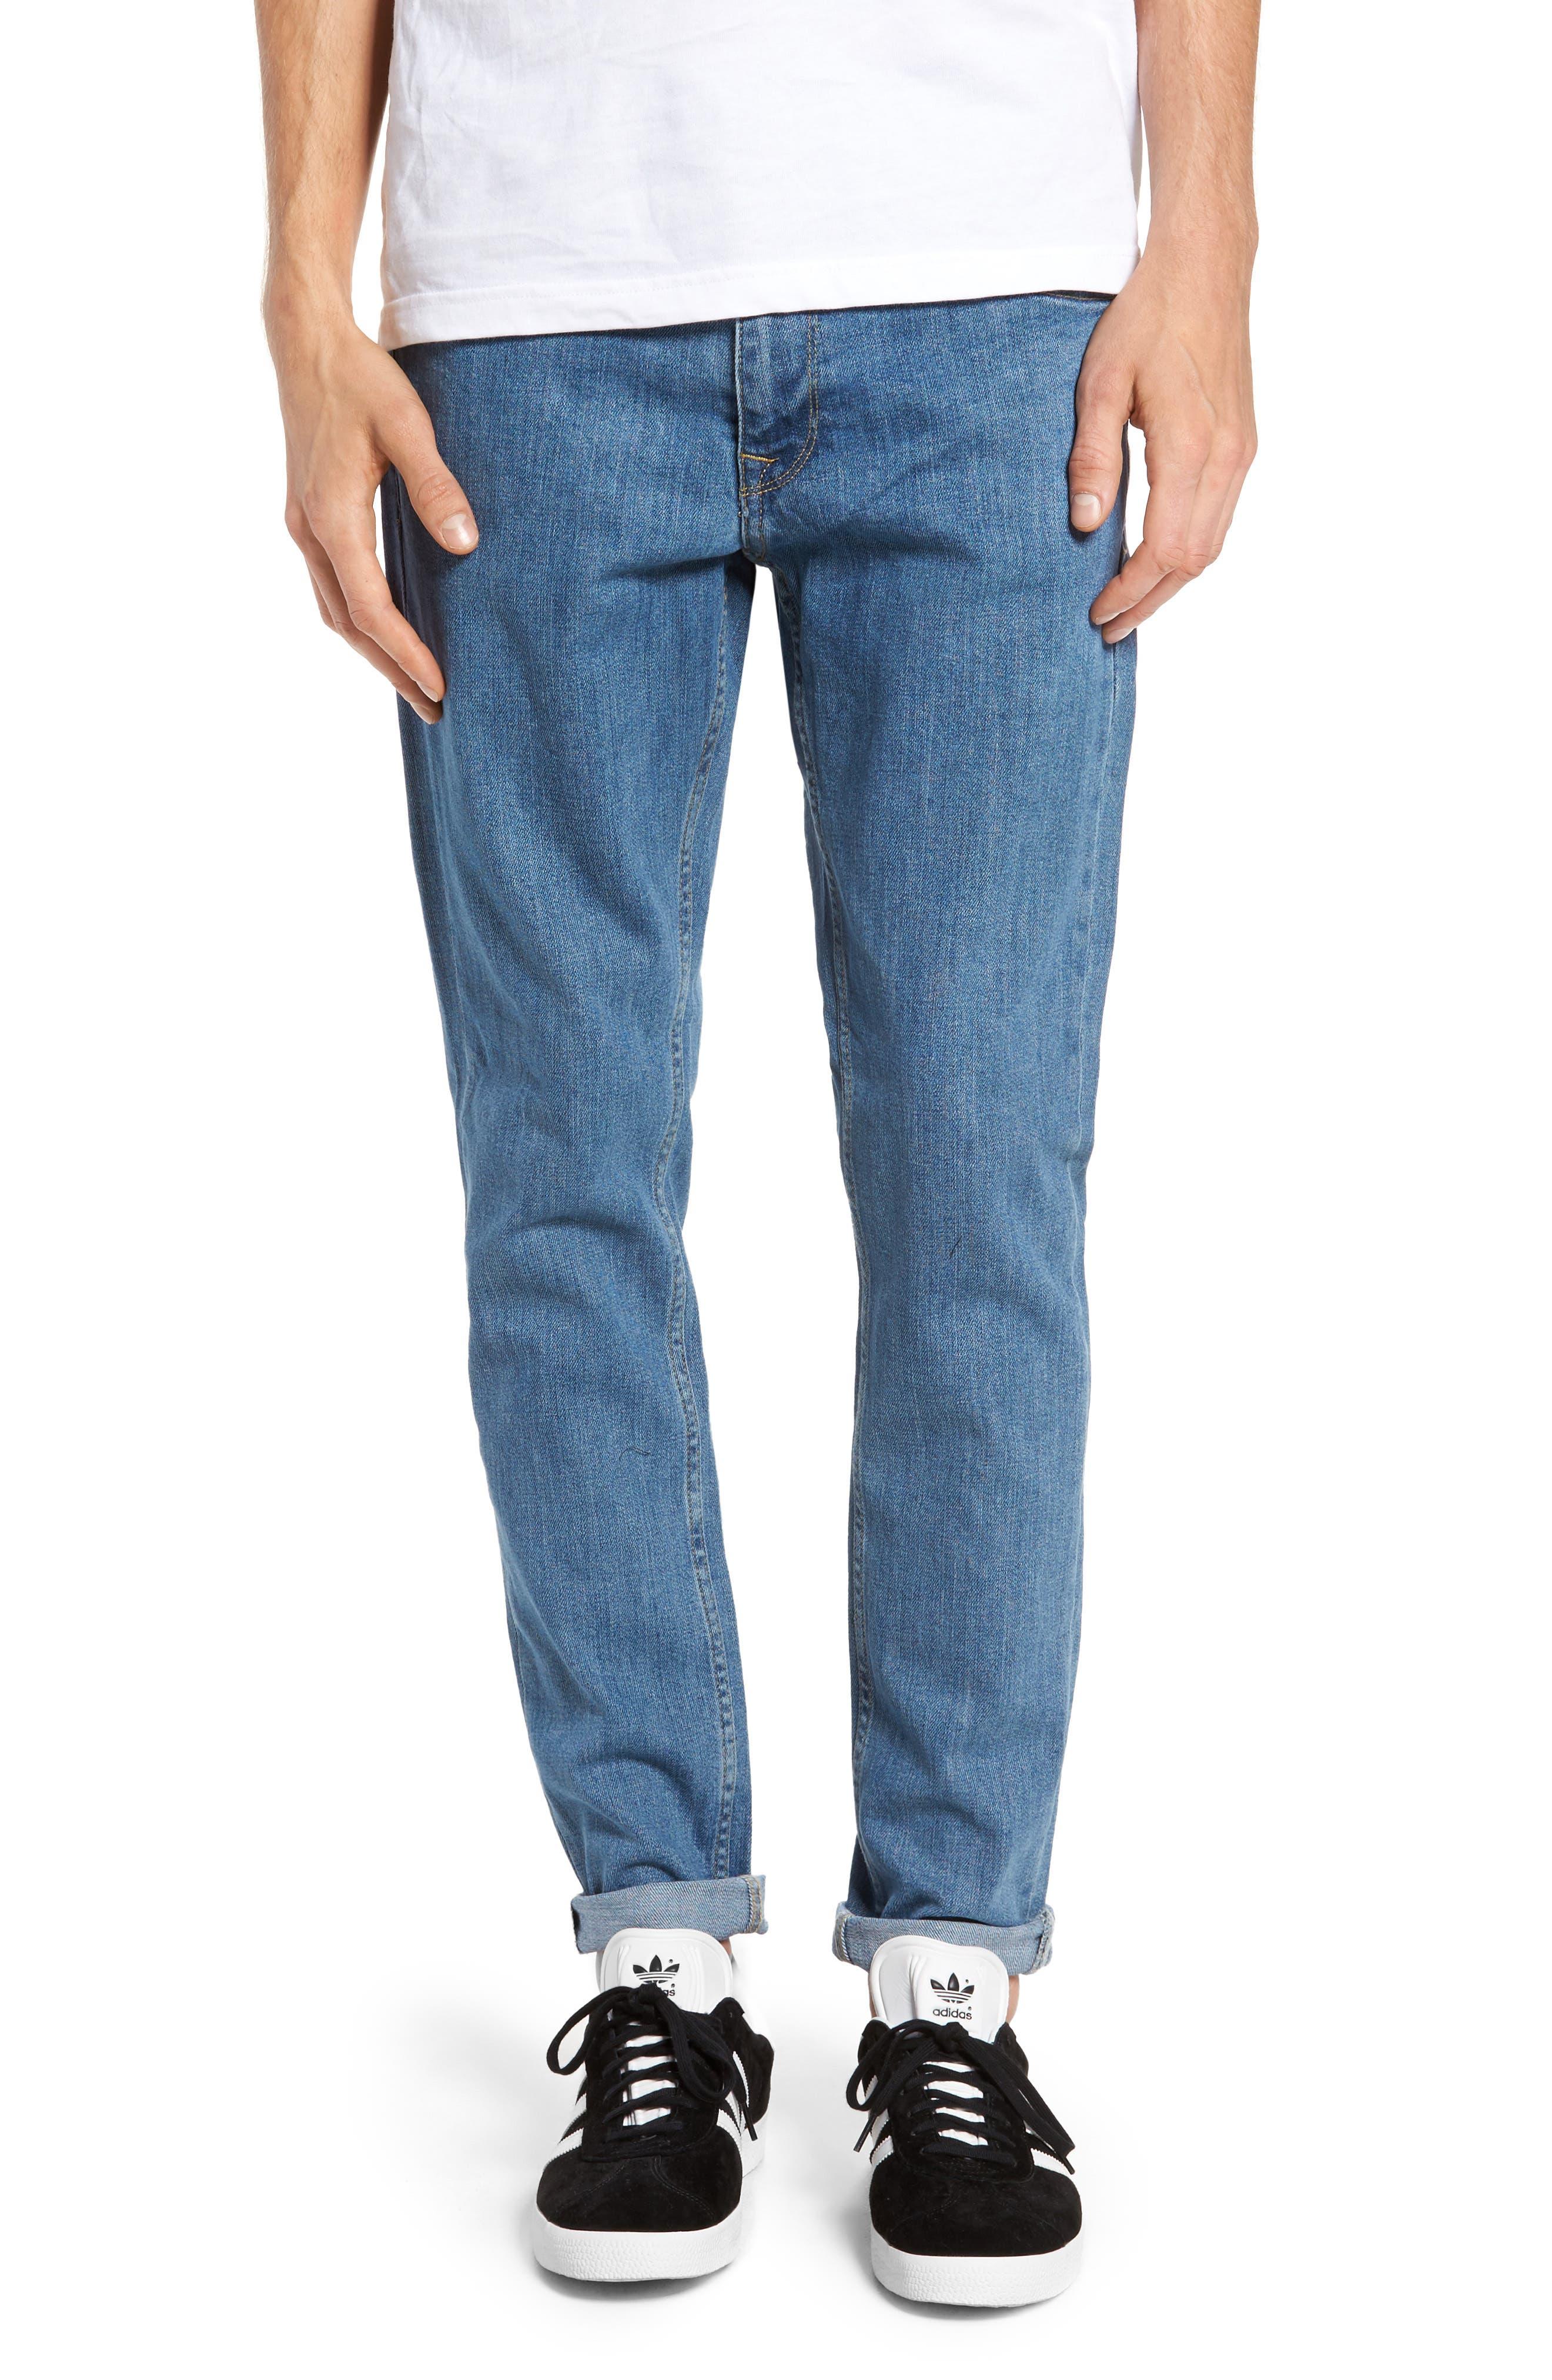 Clark Slim Straight Fit Jeans,                             Main thumbnail 1, color,